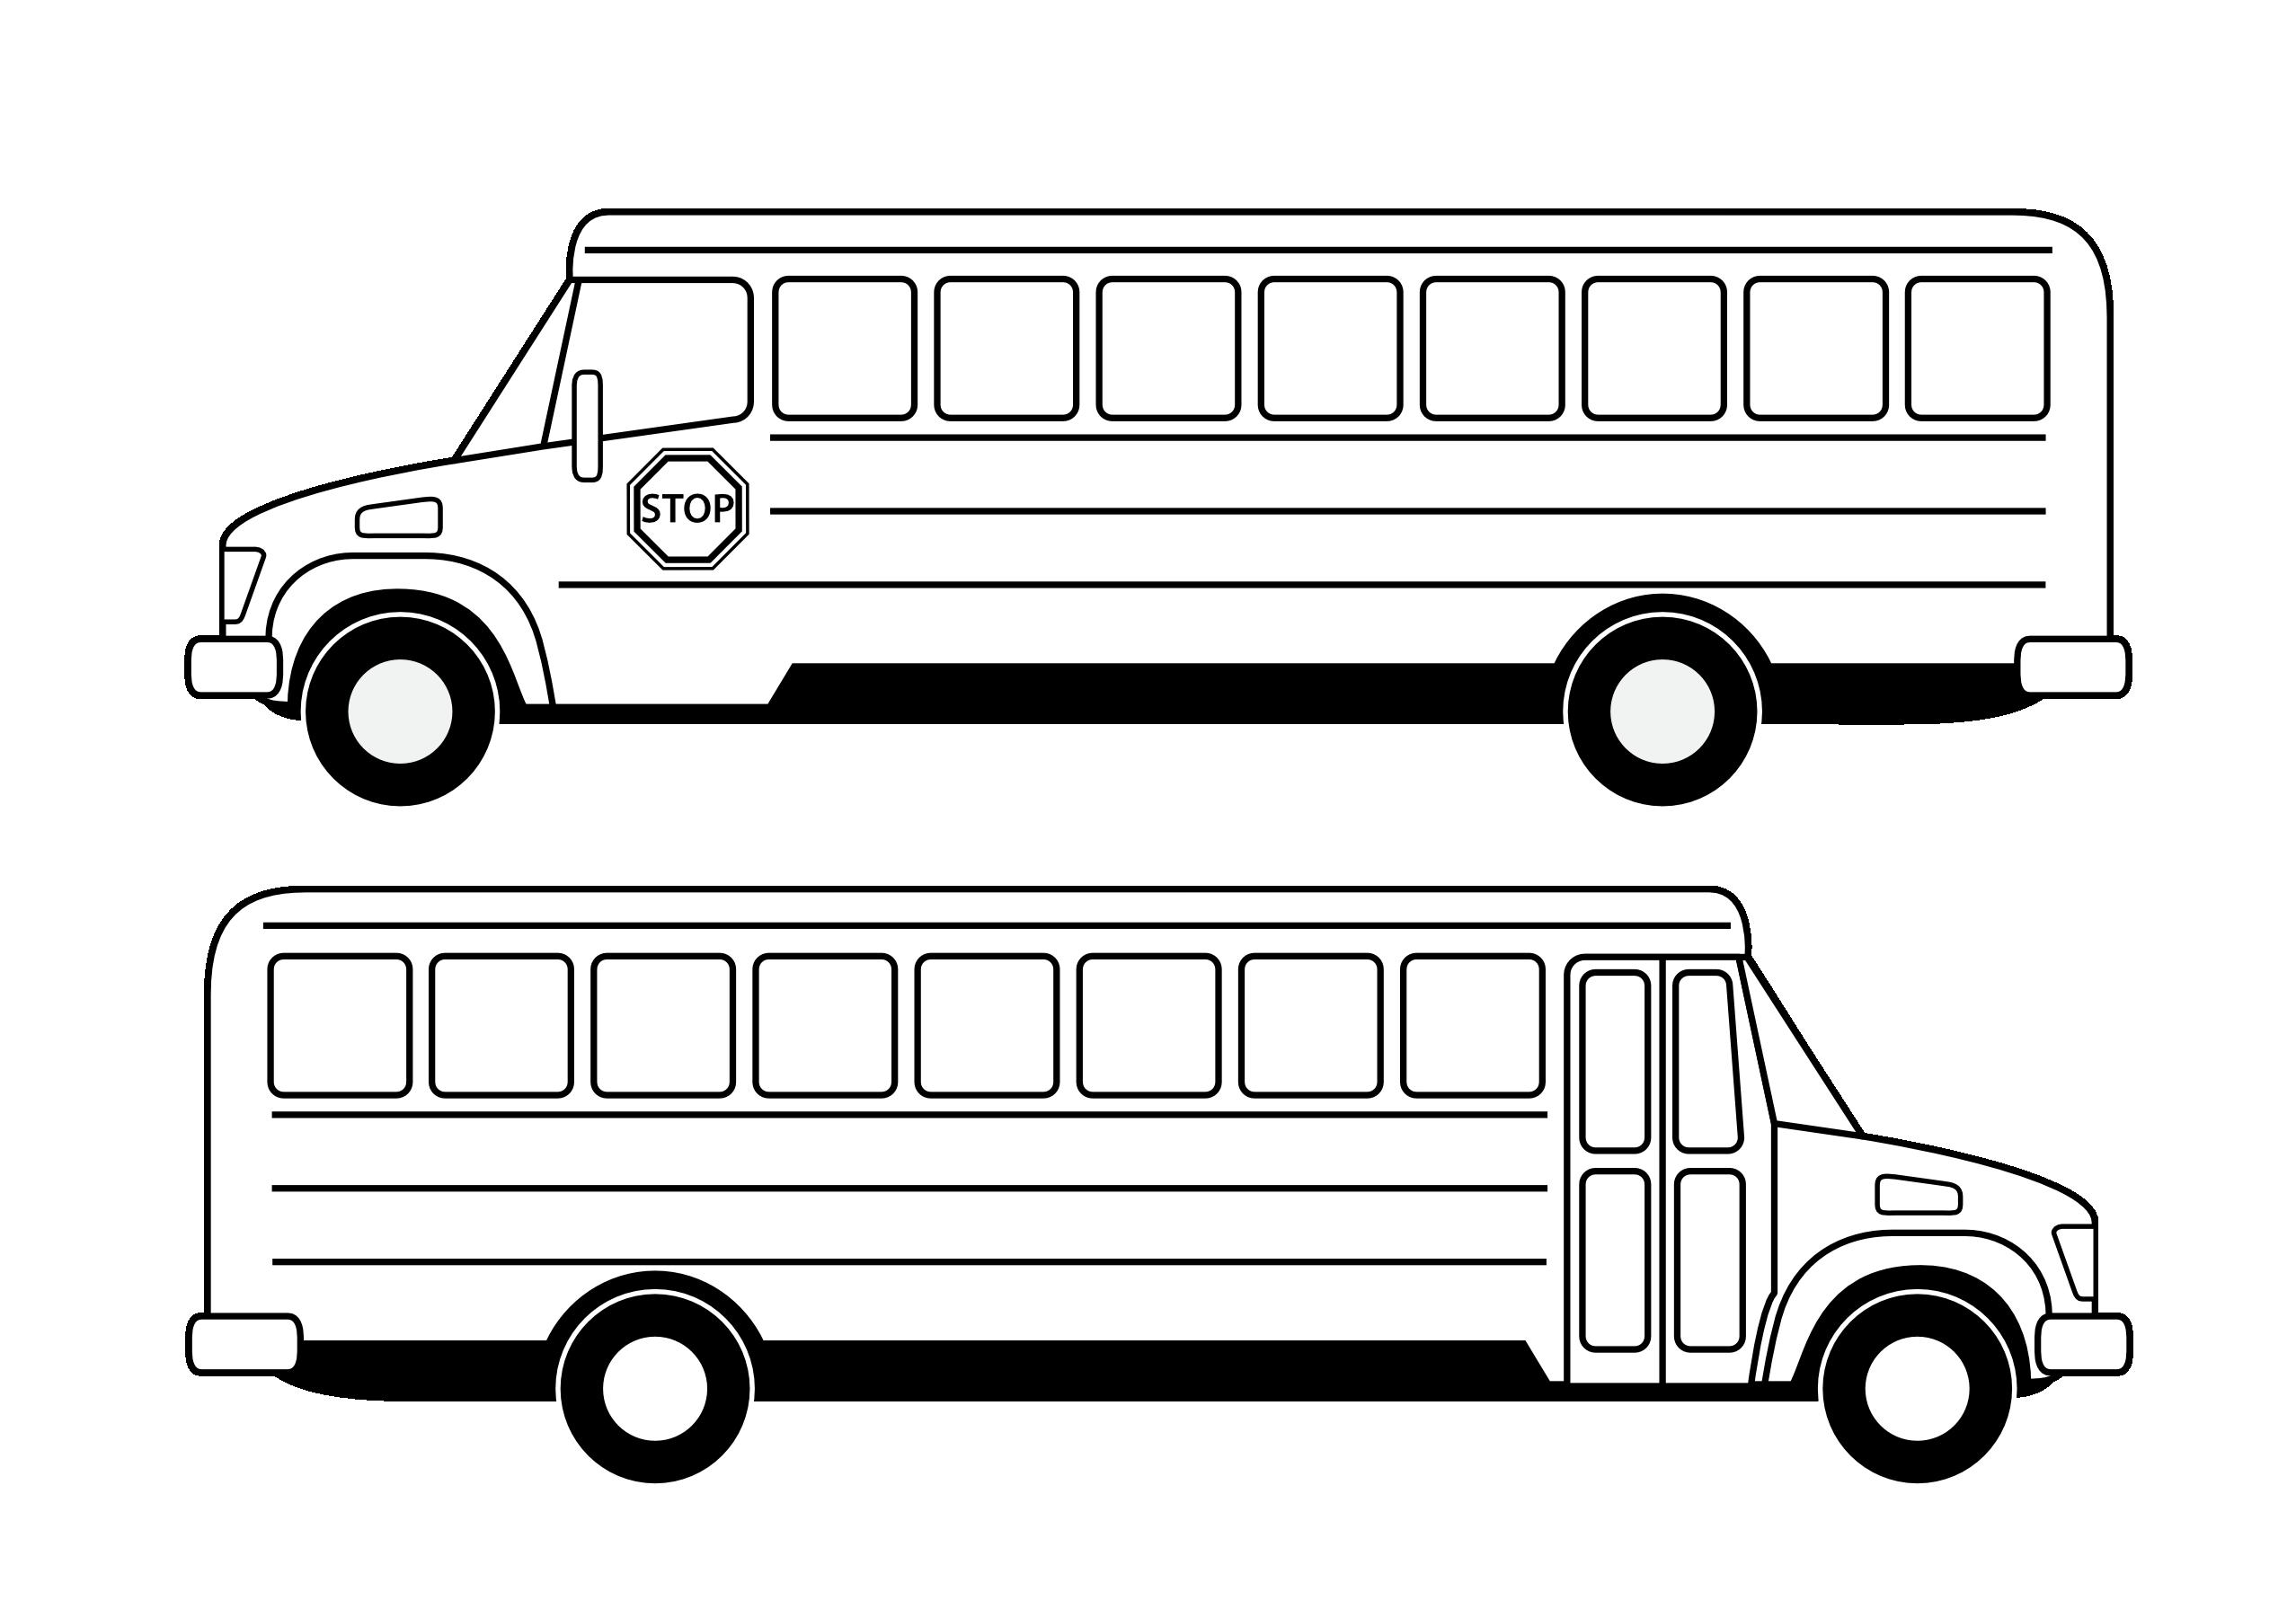 Bus School Outline Clipart - Clipart Kid